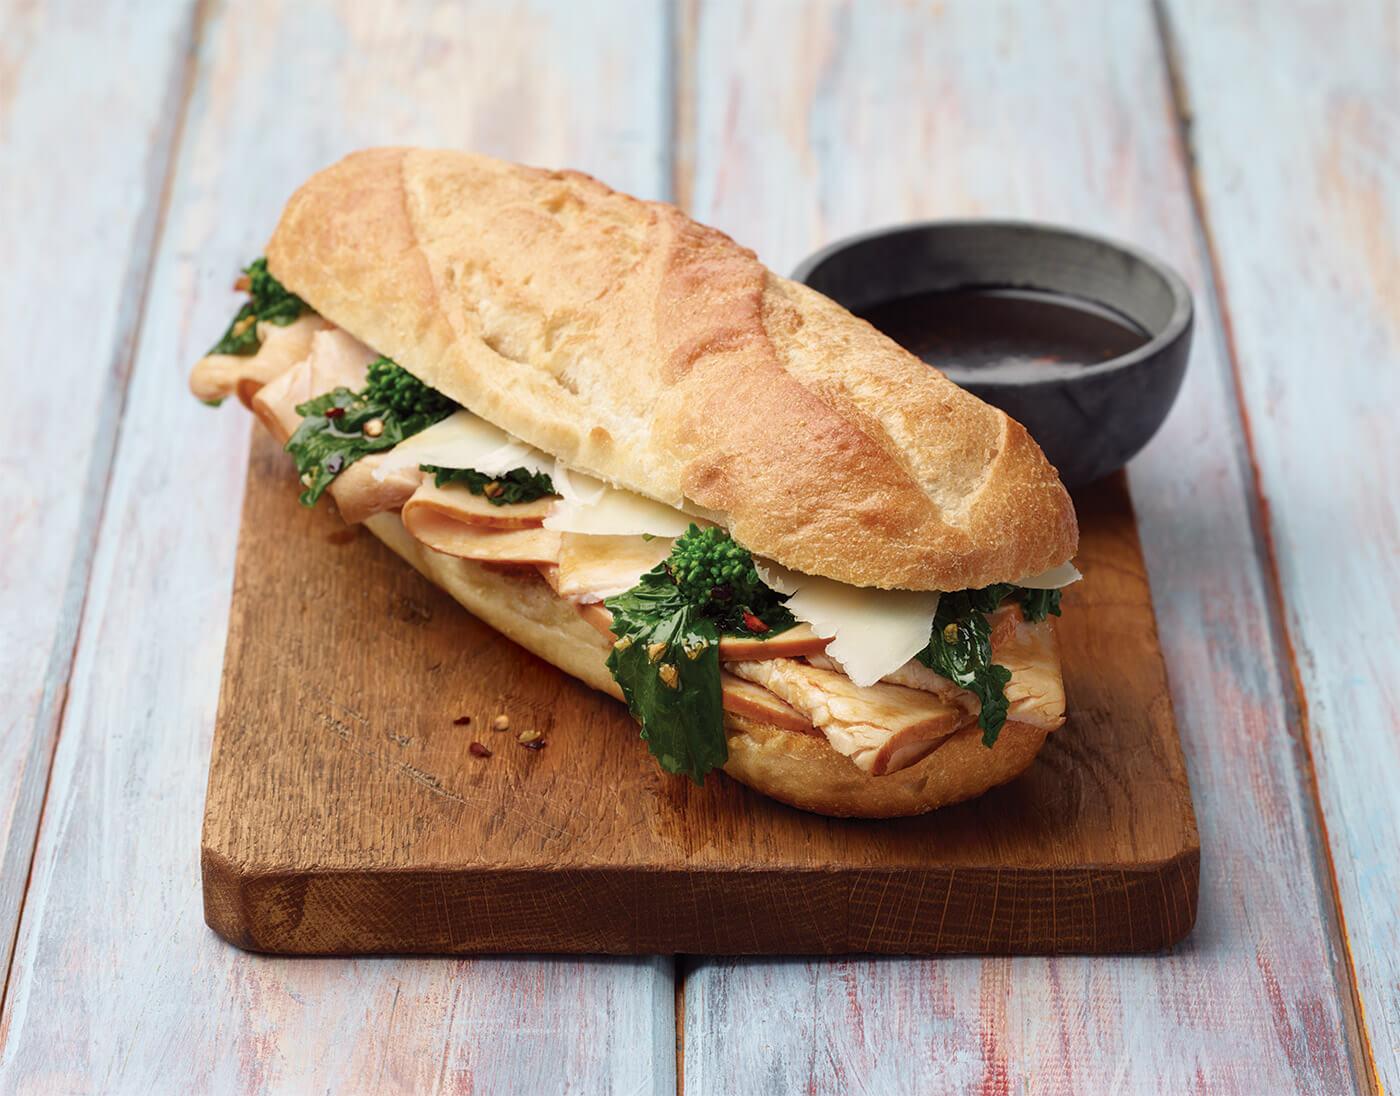 Philly Roasted Turkey Sandwich